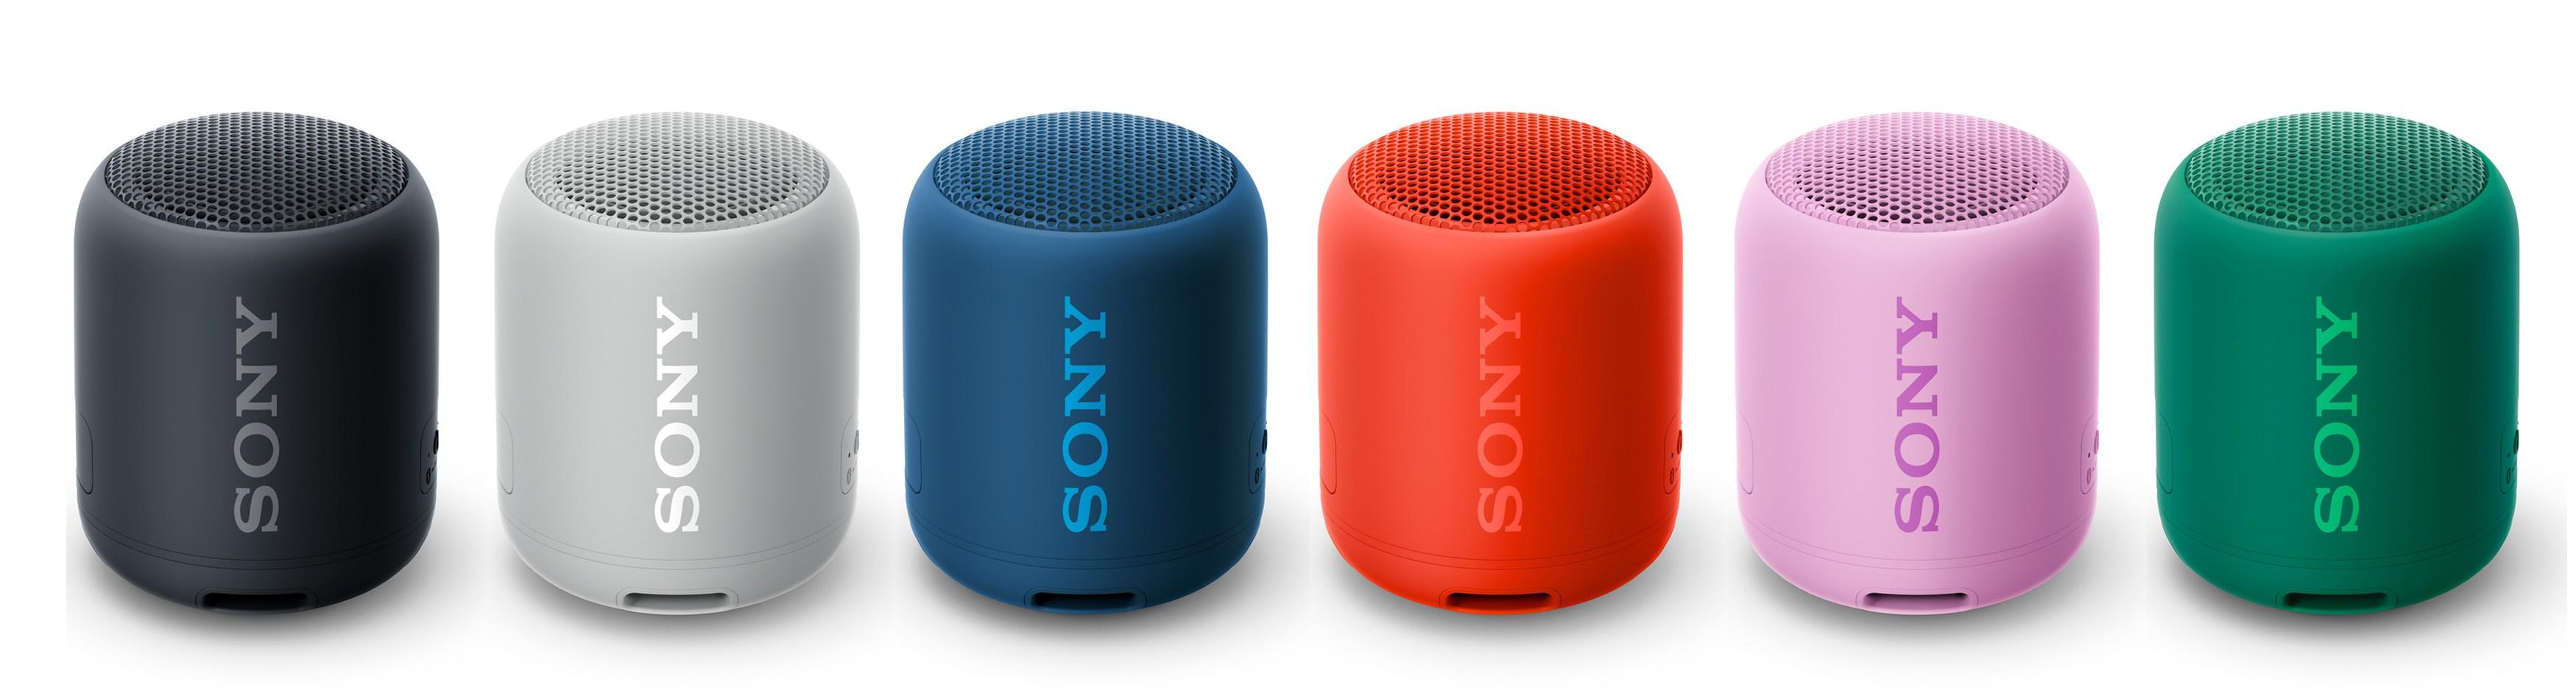 Sony SRS-XB12 共提供6色豐富選擇,隨行釋放EXTRA BASS 音樂能量。